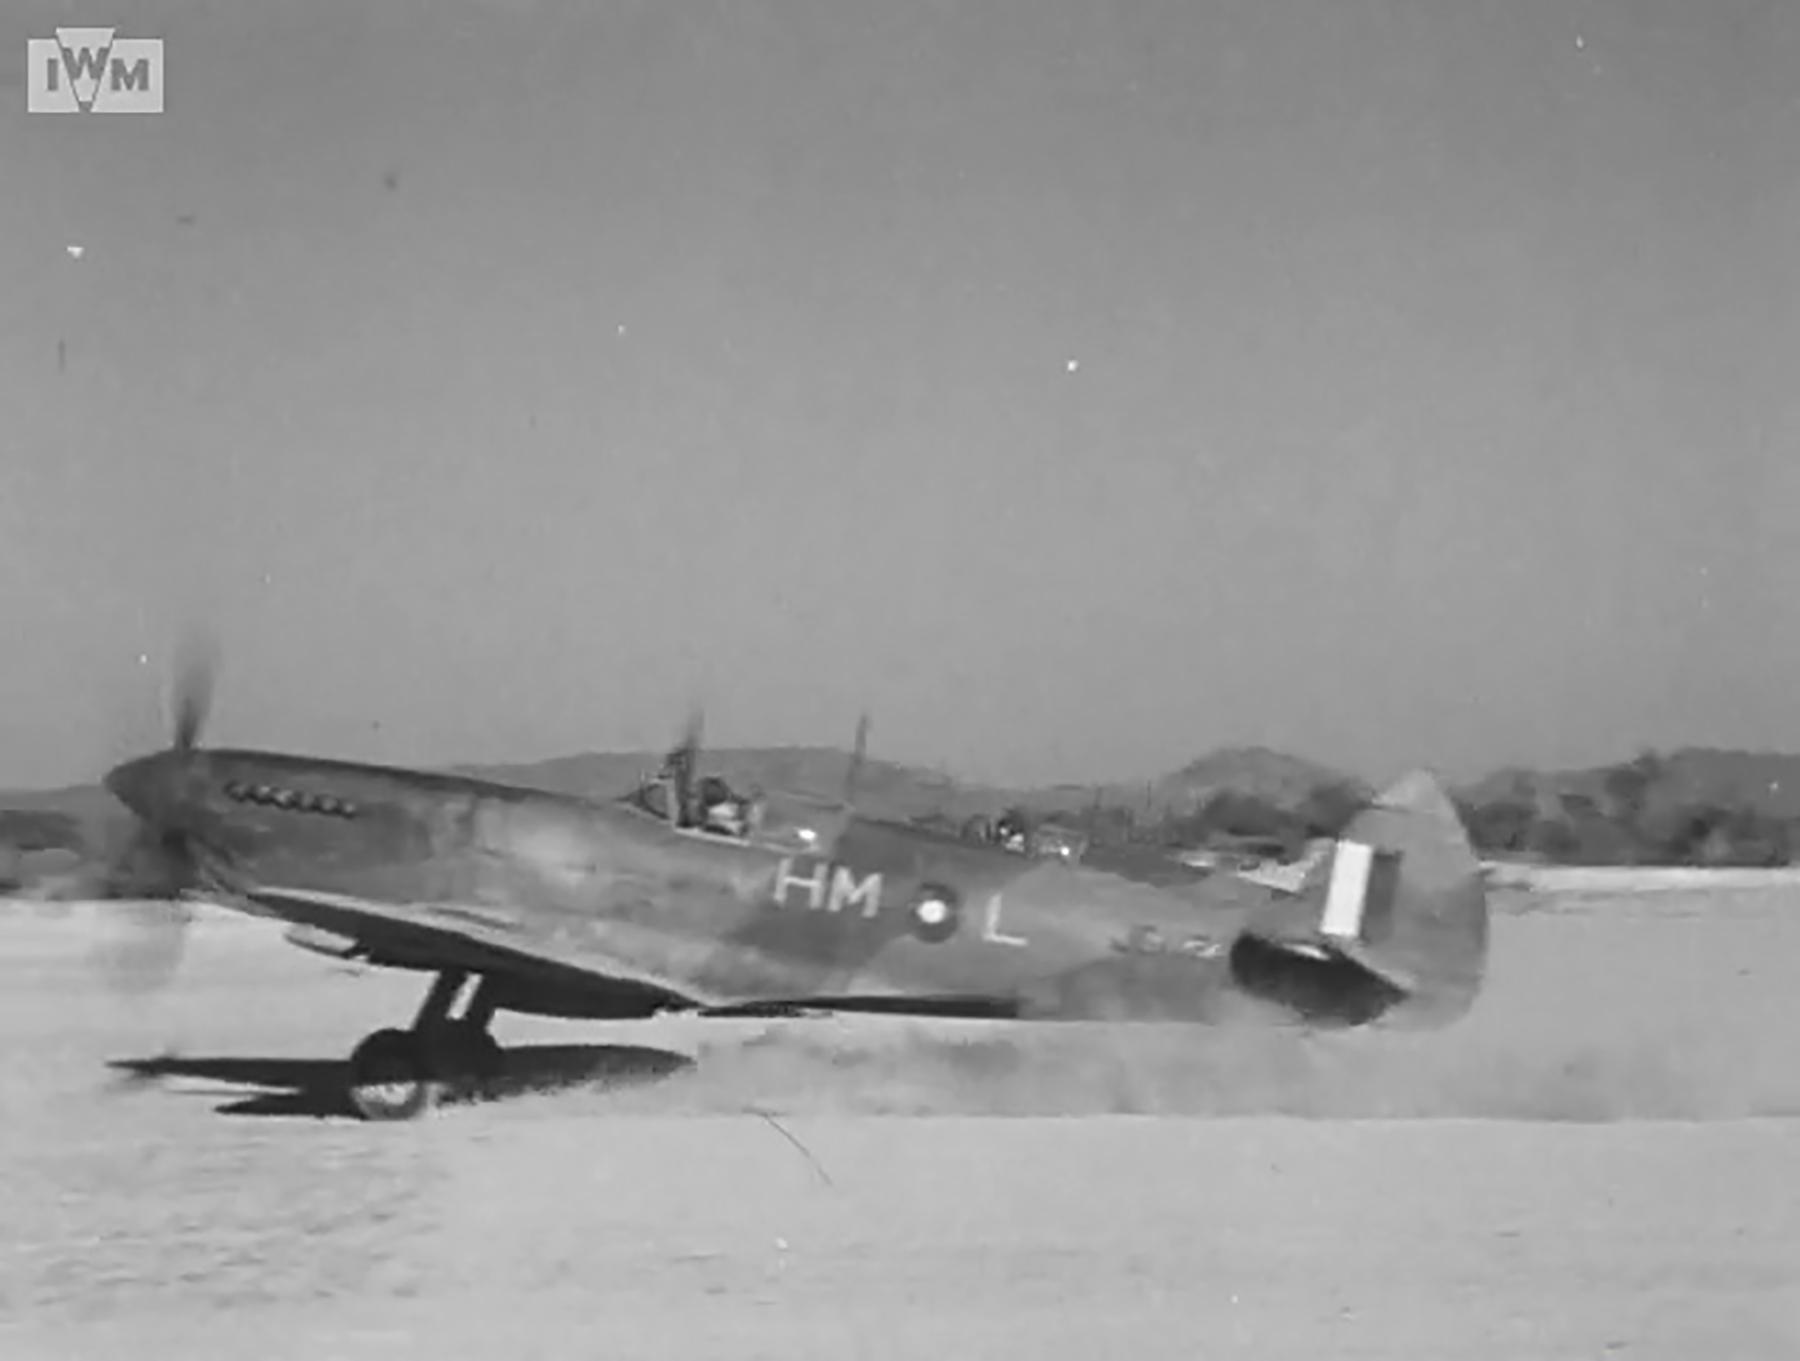 Spitfire VIII RAF 136Sqn HML JG112 at Rumkhapalong operating over Burma CBI 1944 IWM 03